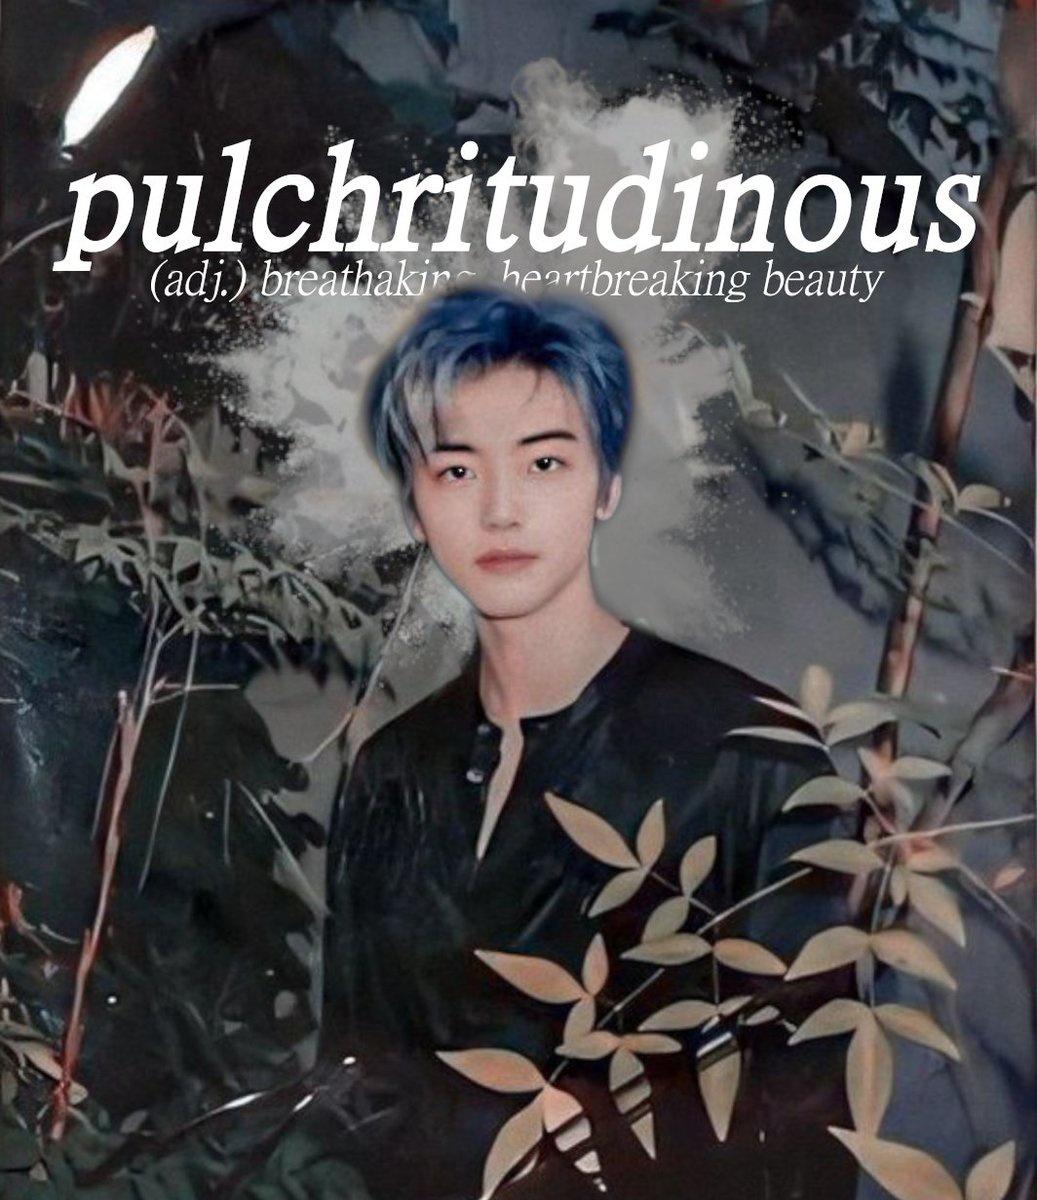 [ made: 15092020 ] - Na Jaemin  pulchritudinous -